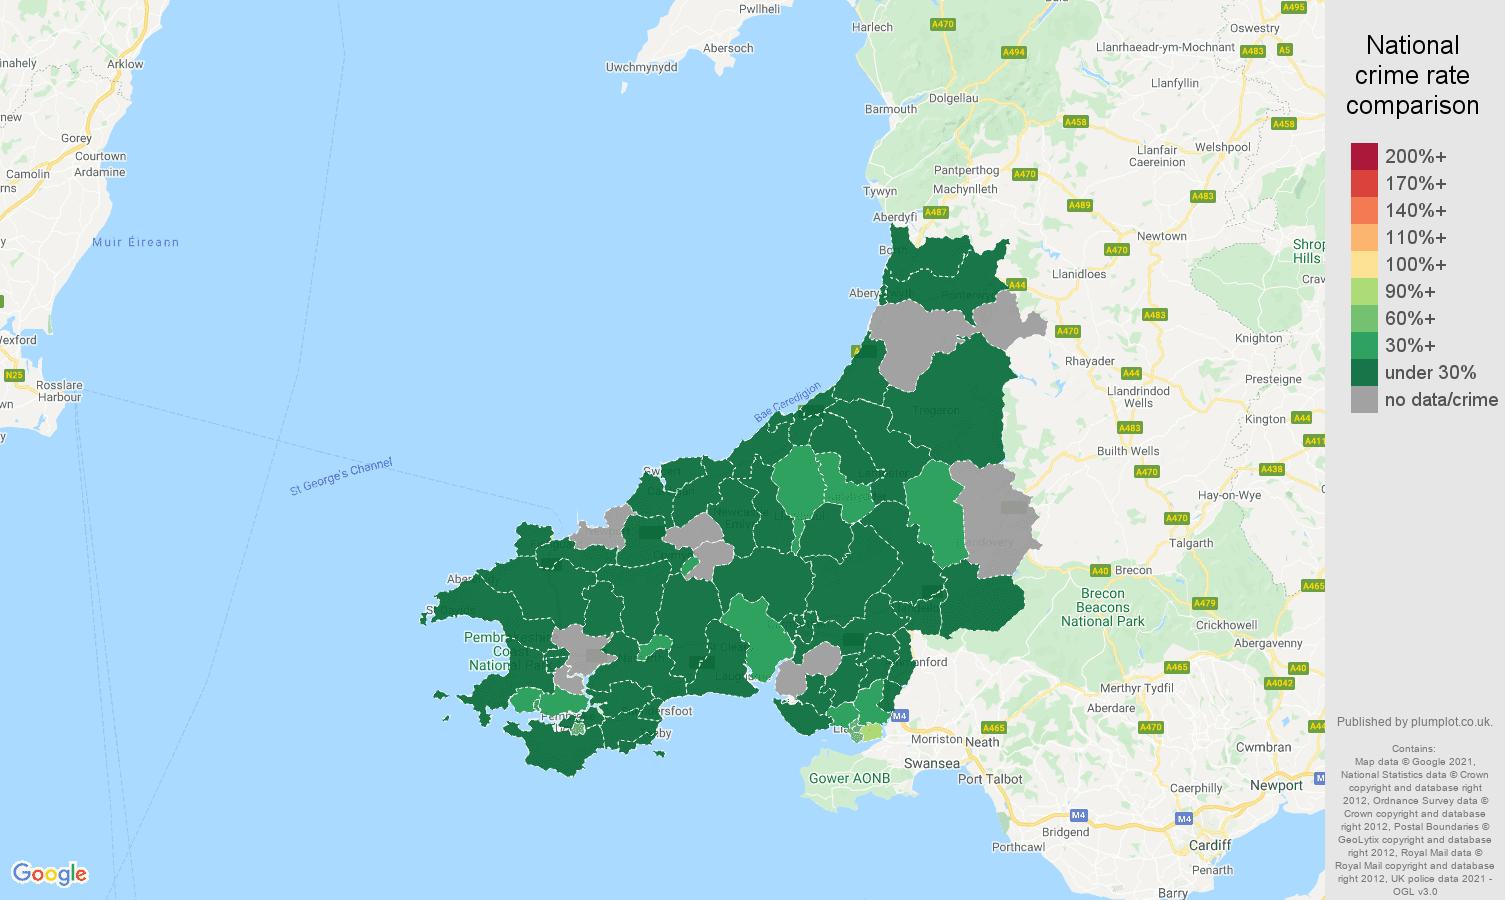 Dyfed vehicle crime rate comparison map